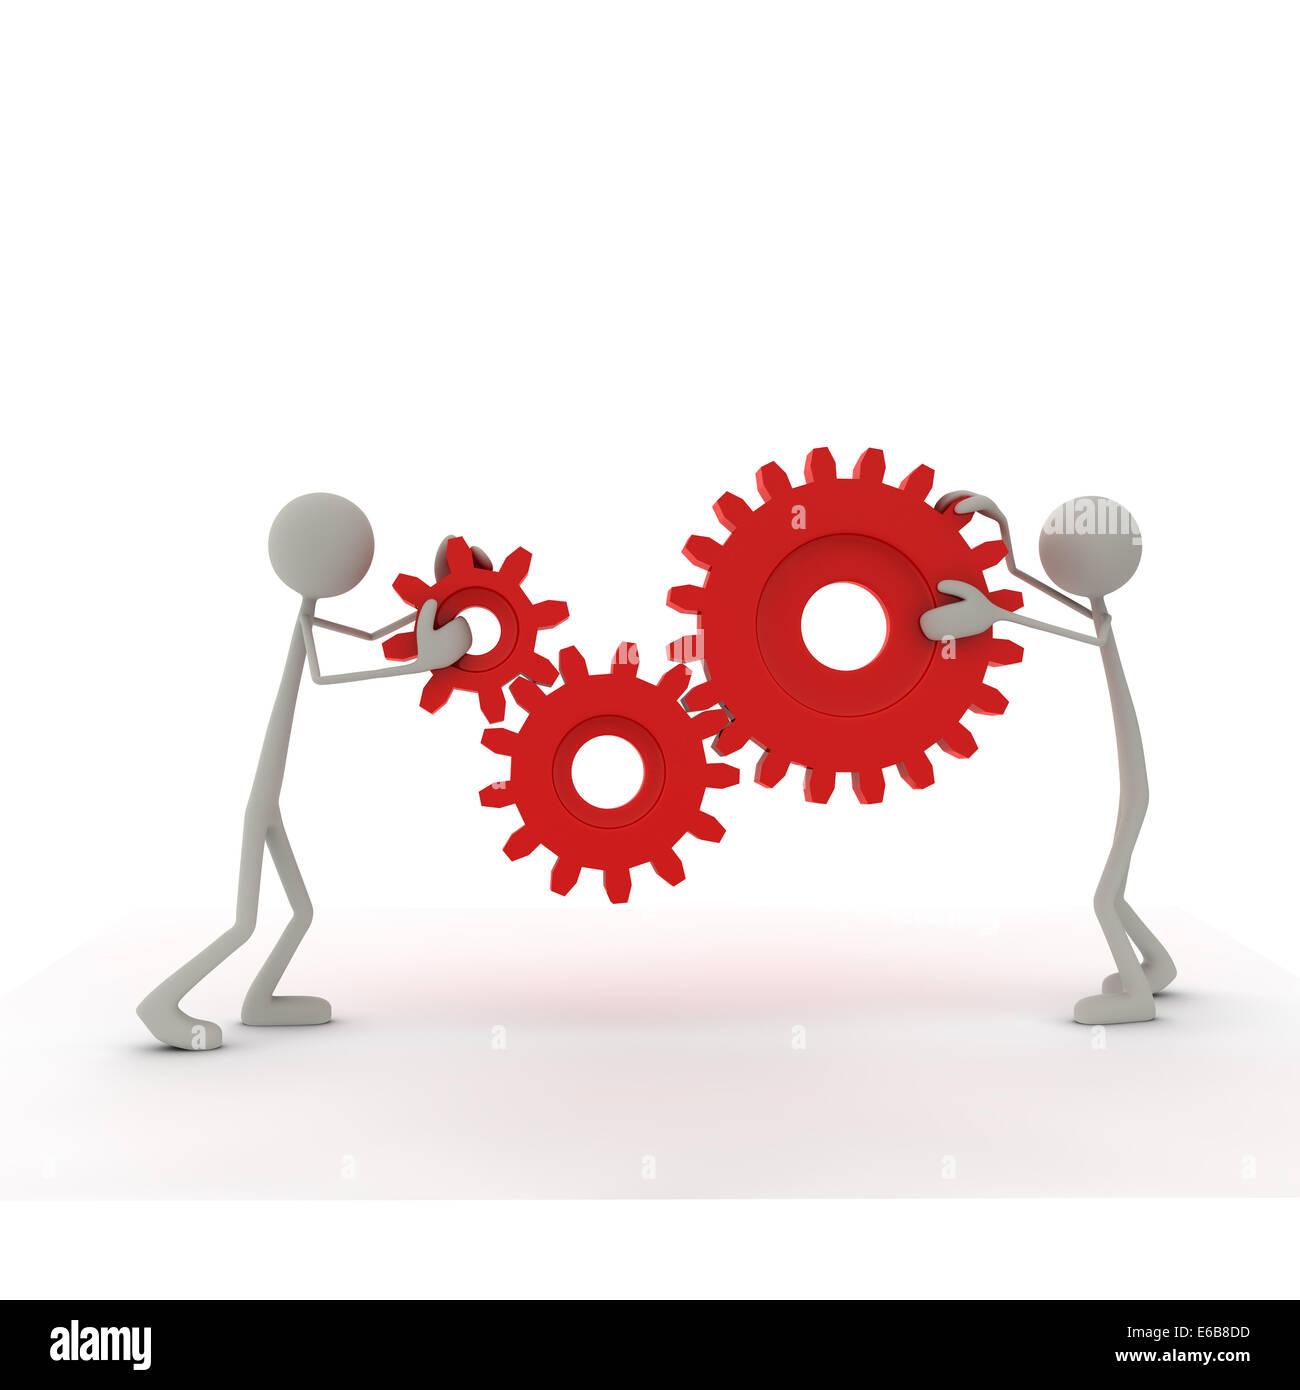 figurine,gear,teamwork - Stock Image